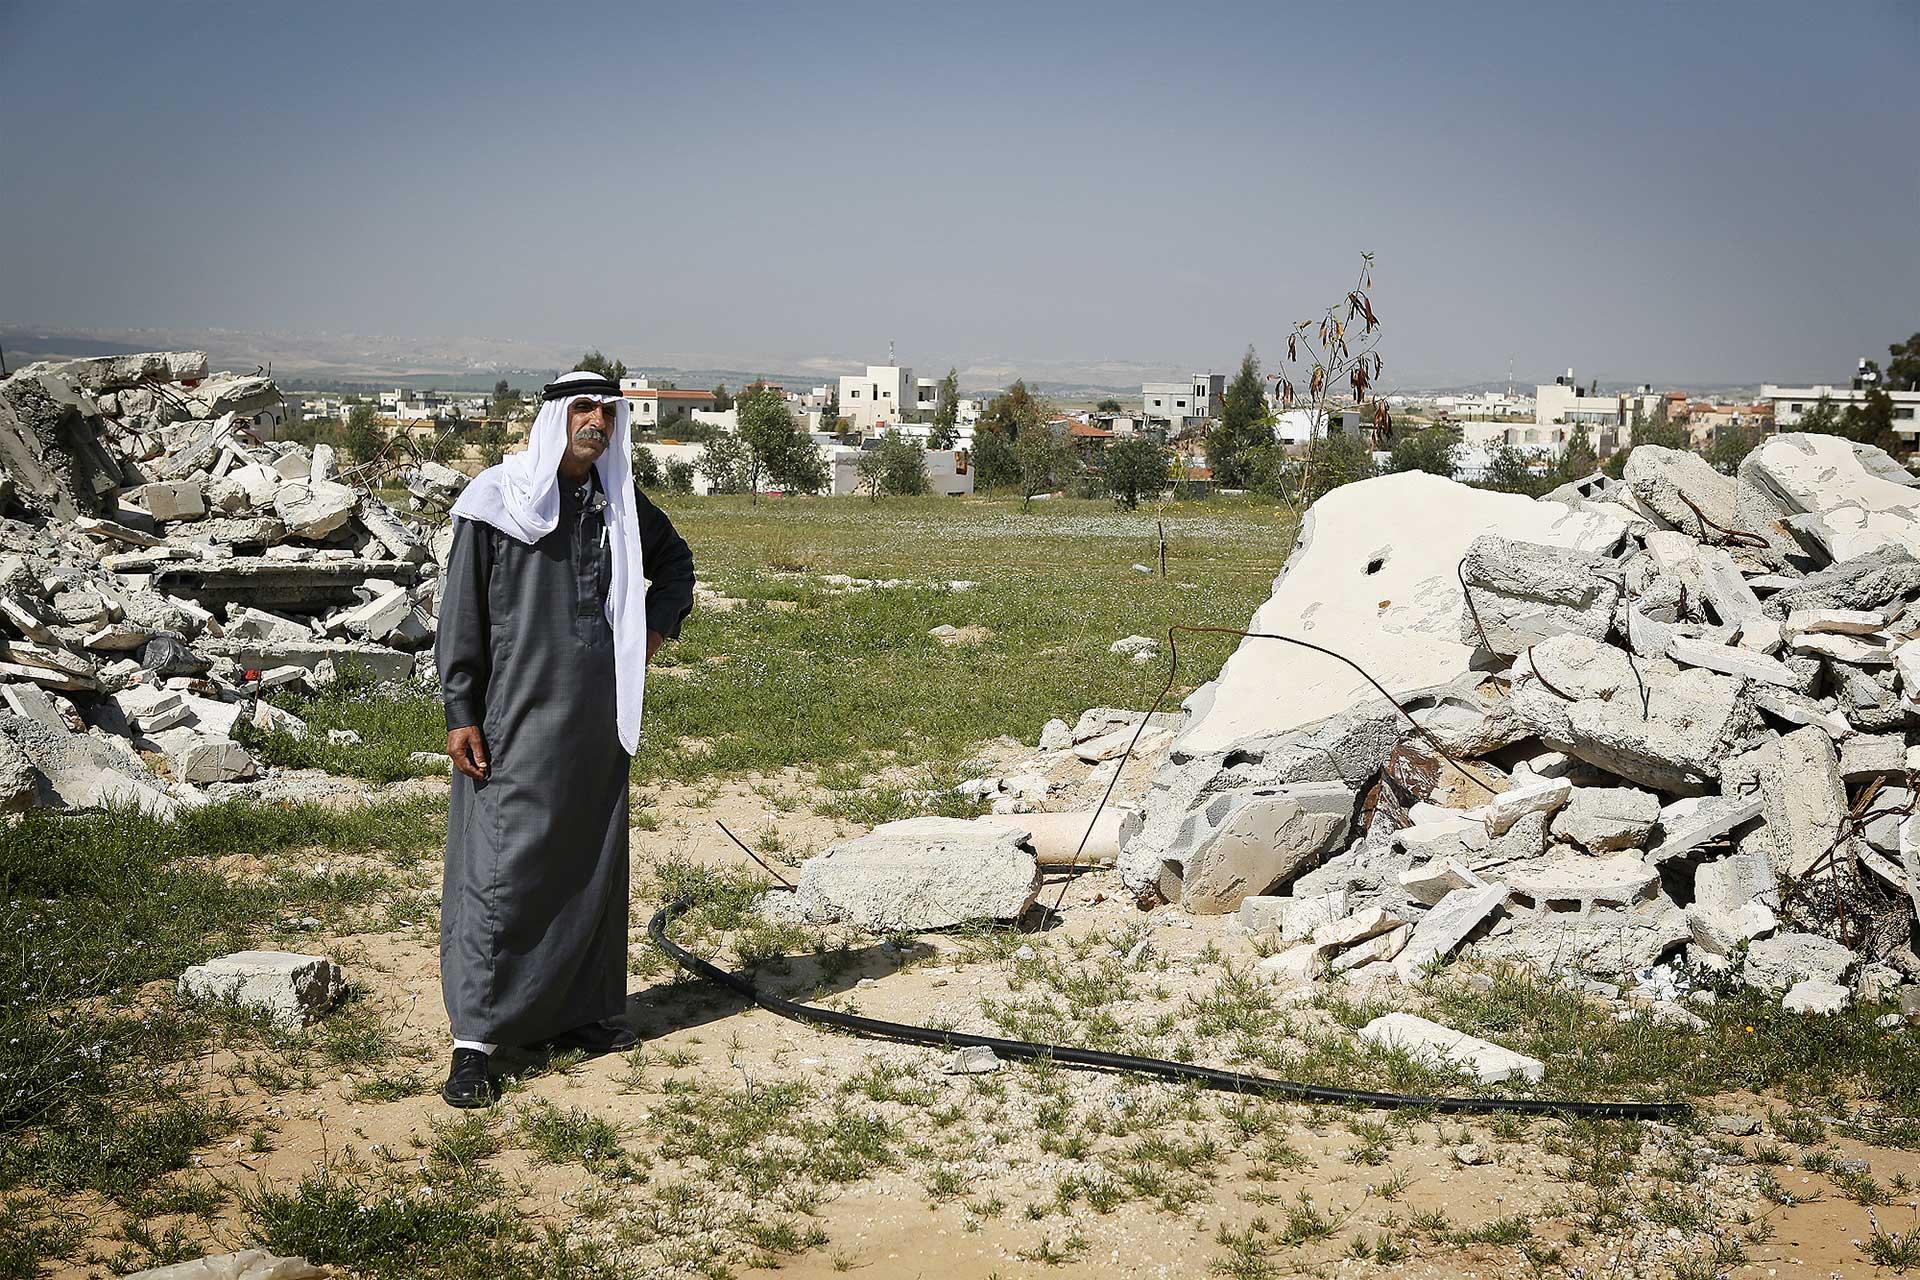 Recognized village of Al Sayed, Israel 2014